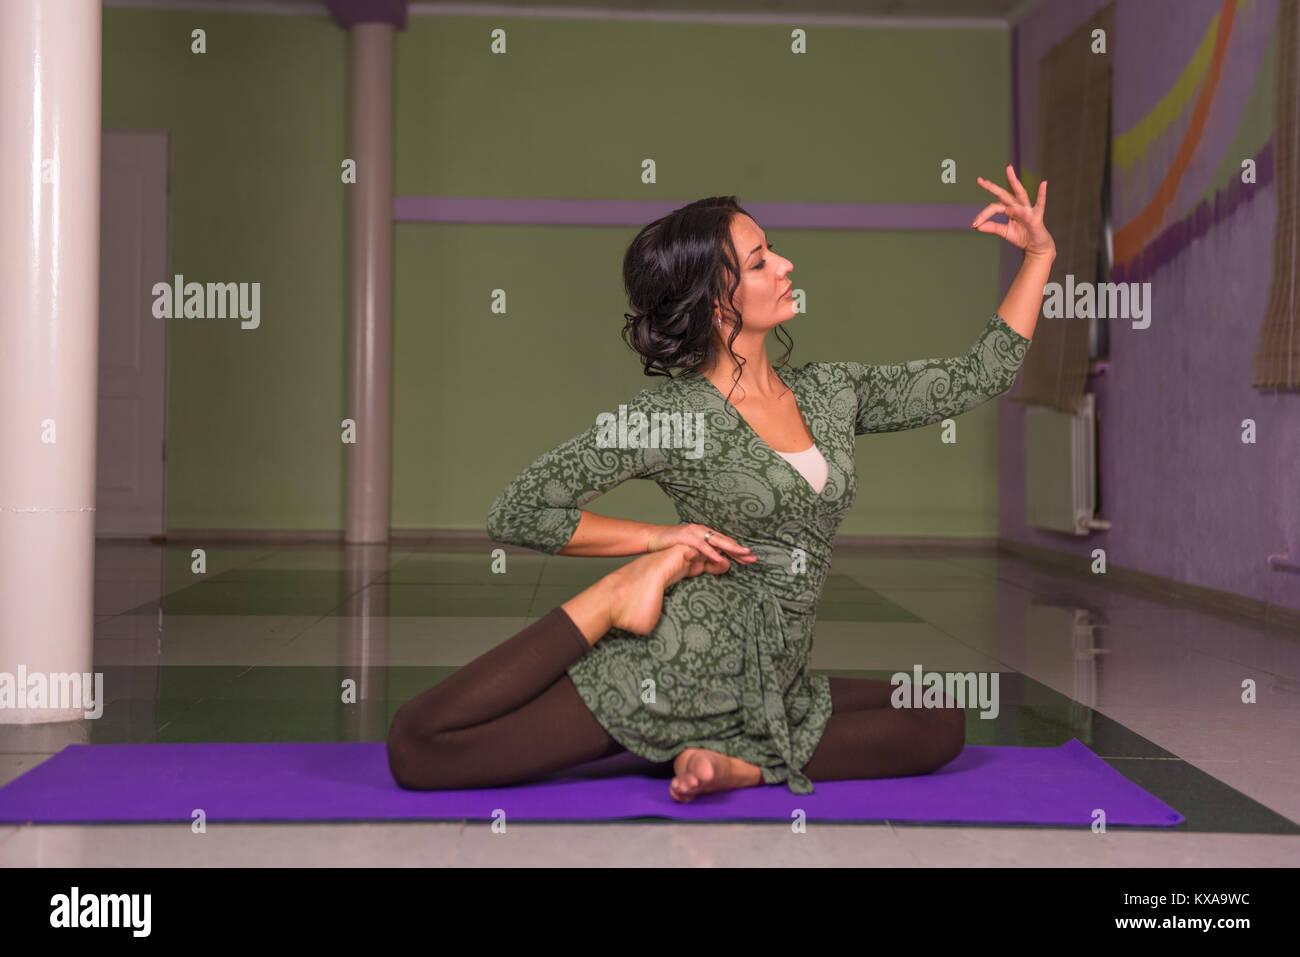 Fit girl performs yoga asana in a studio Stock Photo